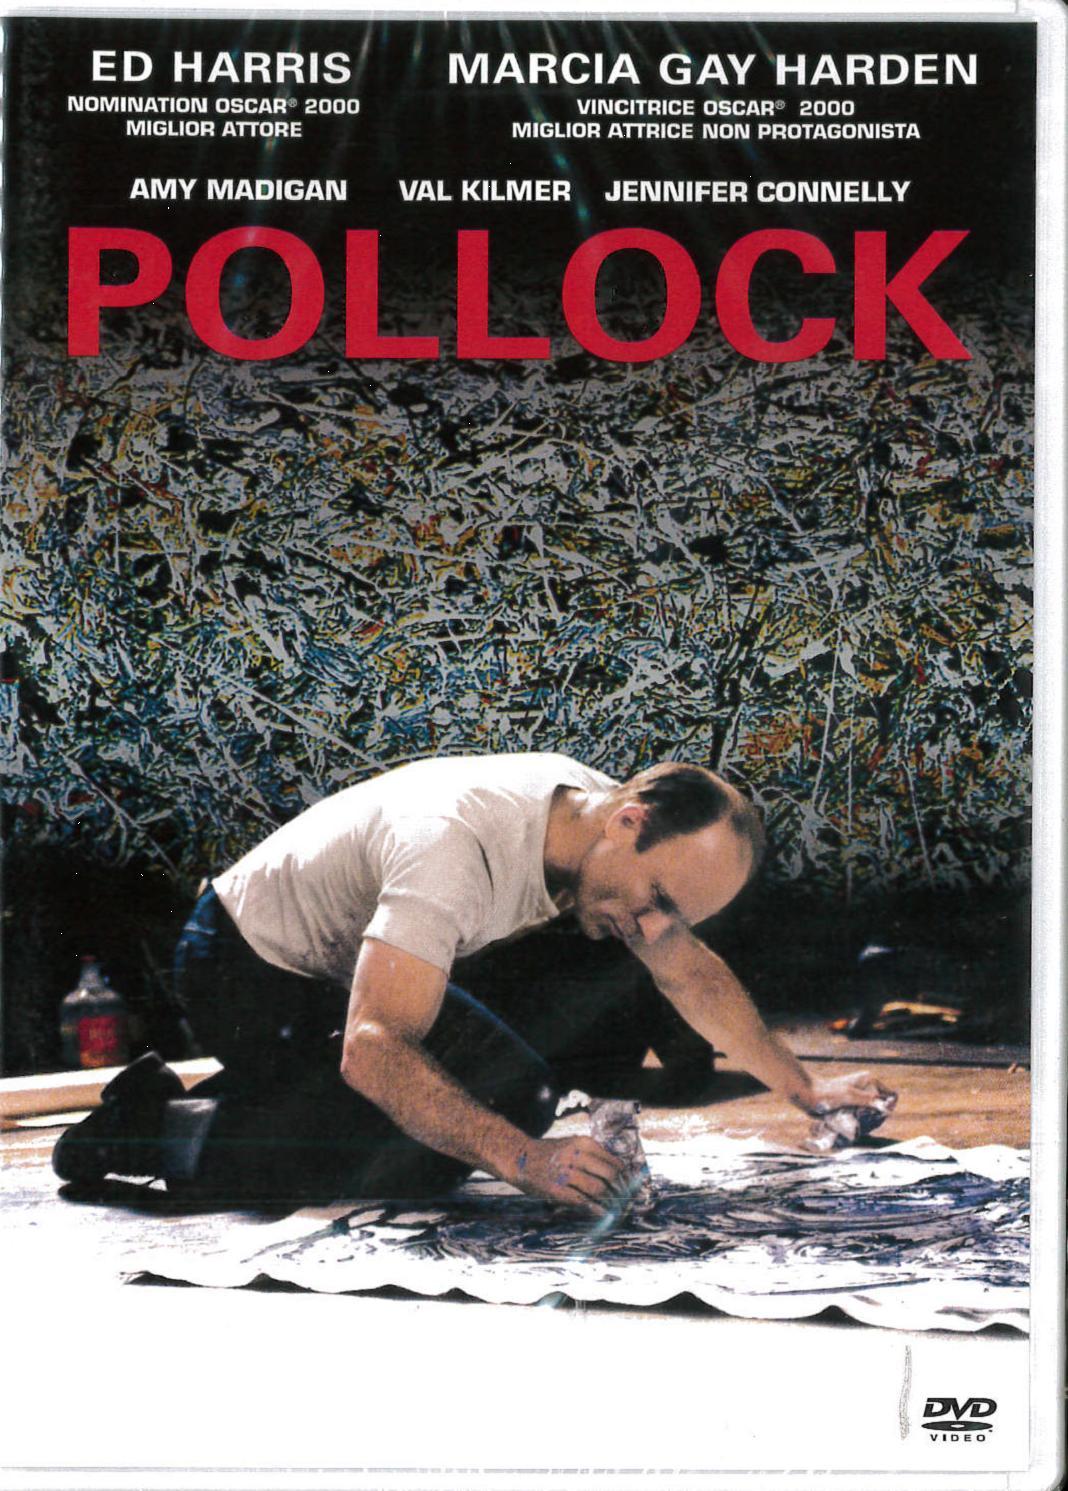 POLLOCK (DVD)